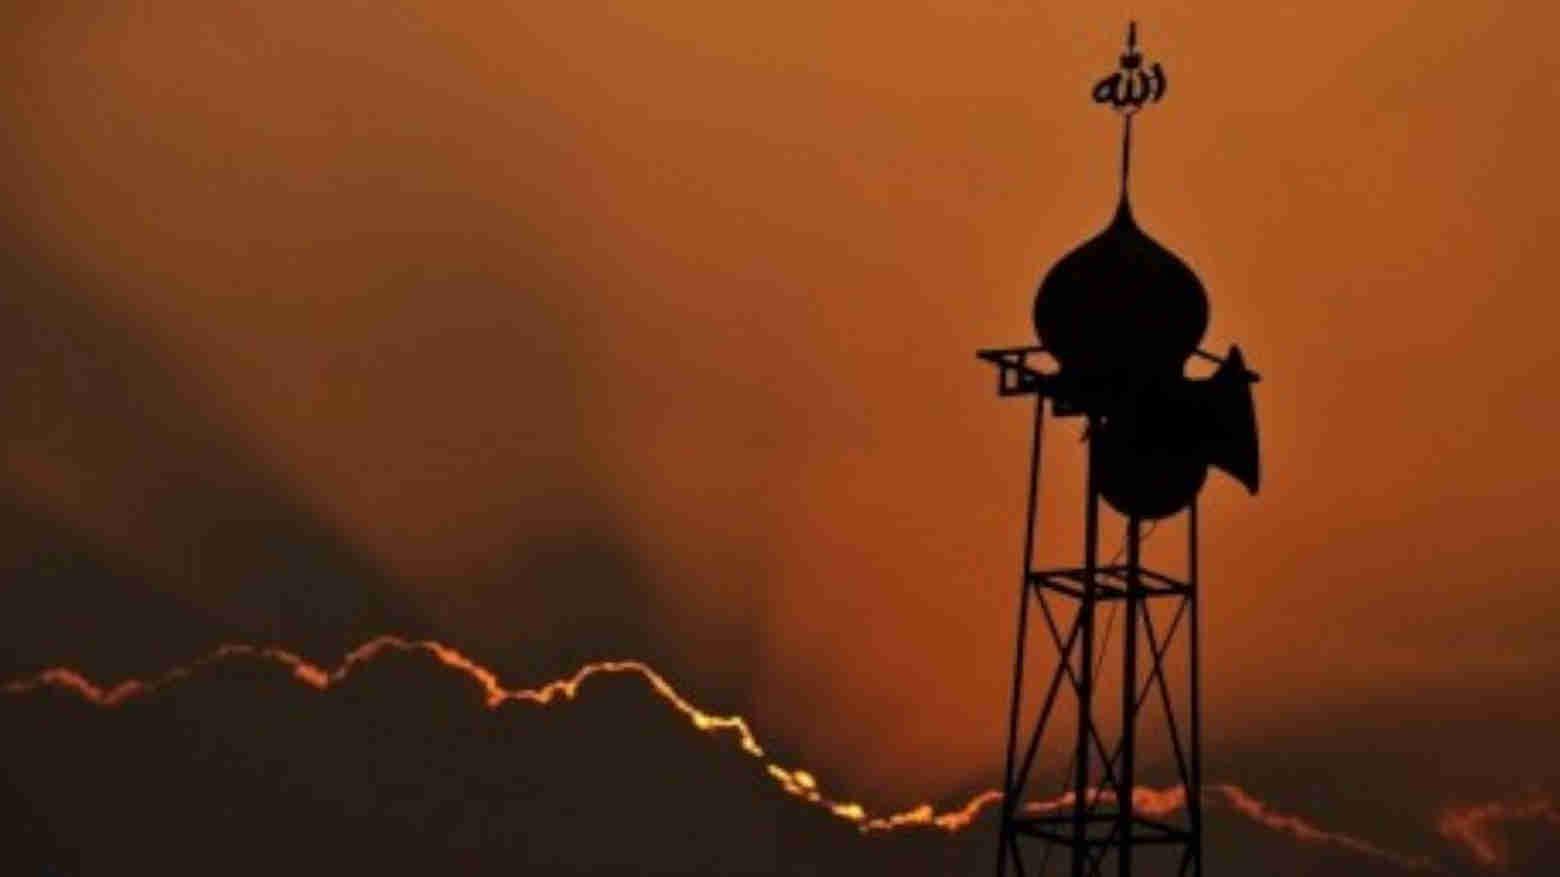 Dewan Masjid bicara seputar polemik pengeras suara masjid